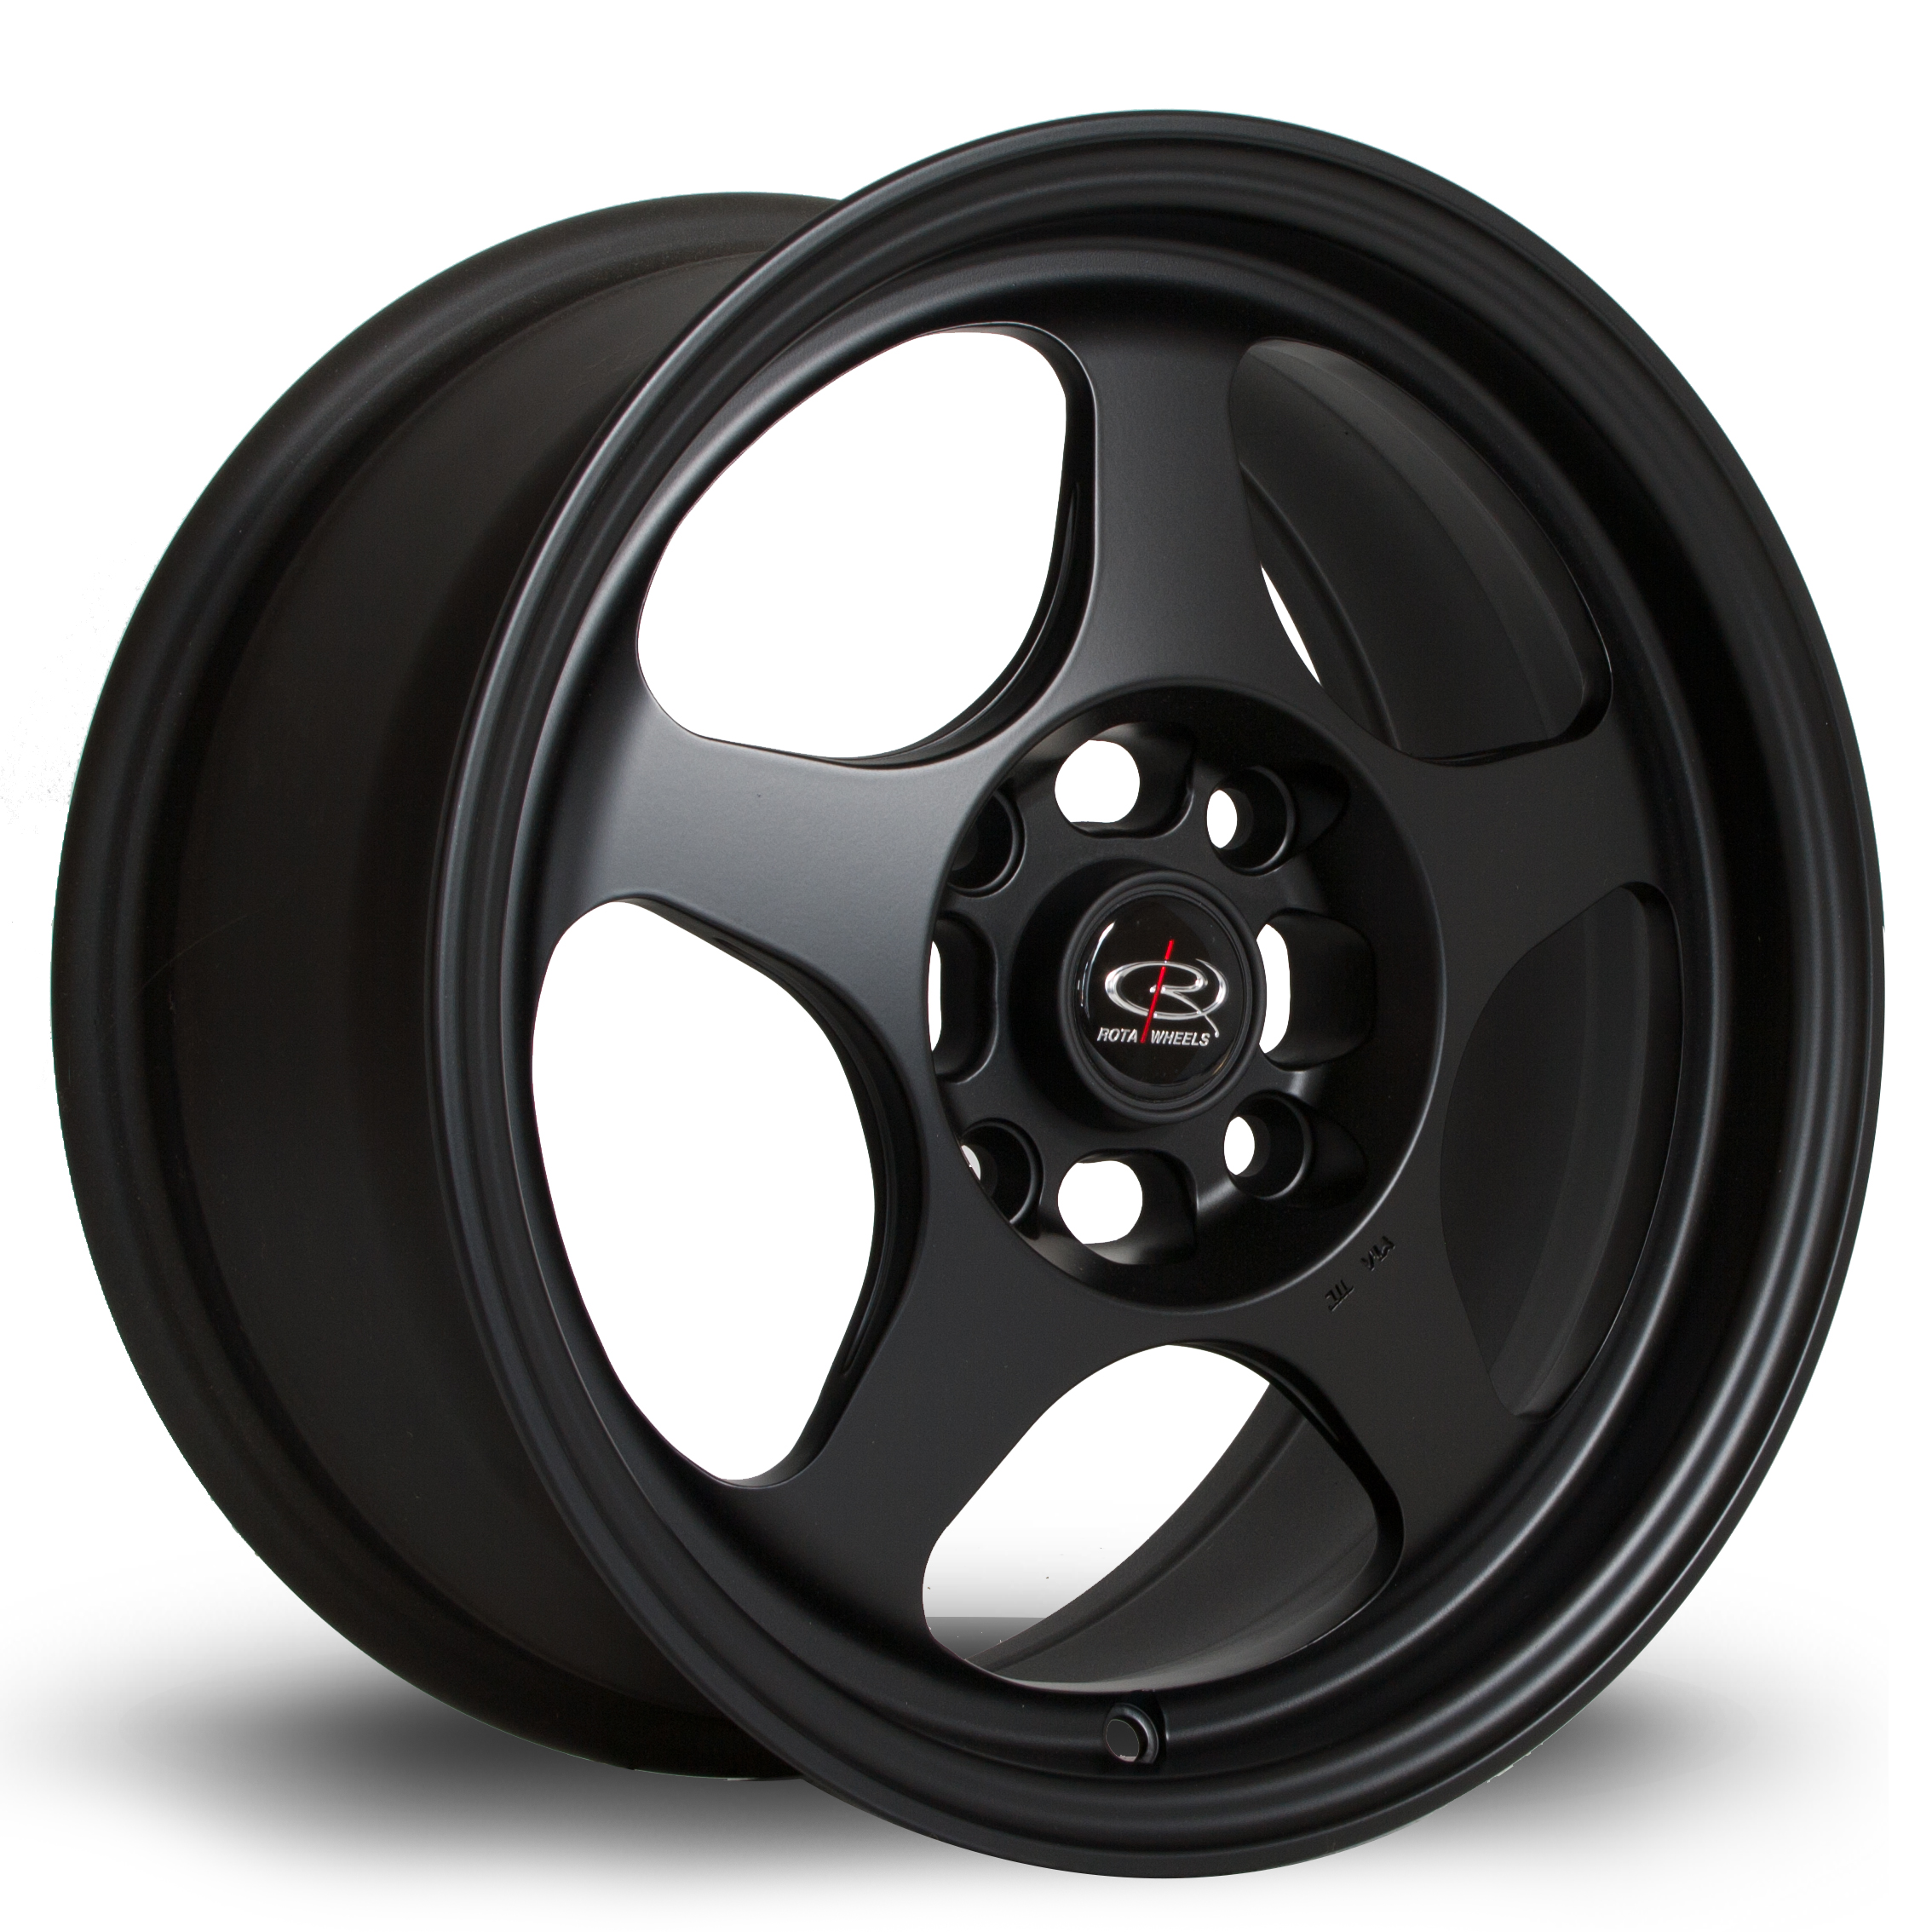 Rota Slip wheels